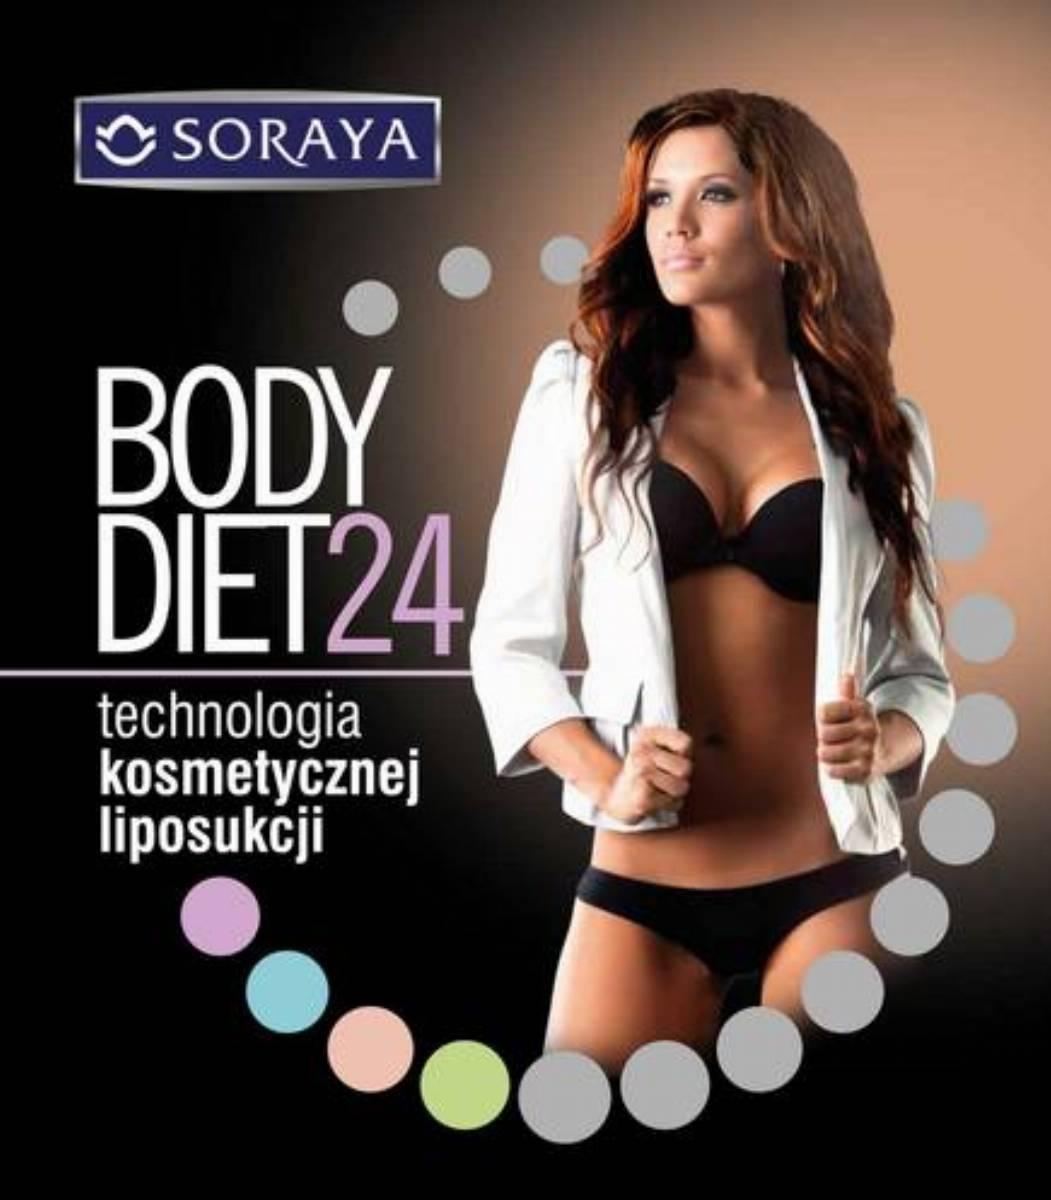 soraya body diet24 konkurs